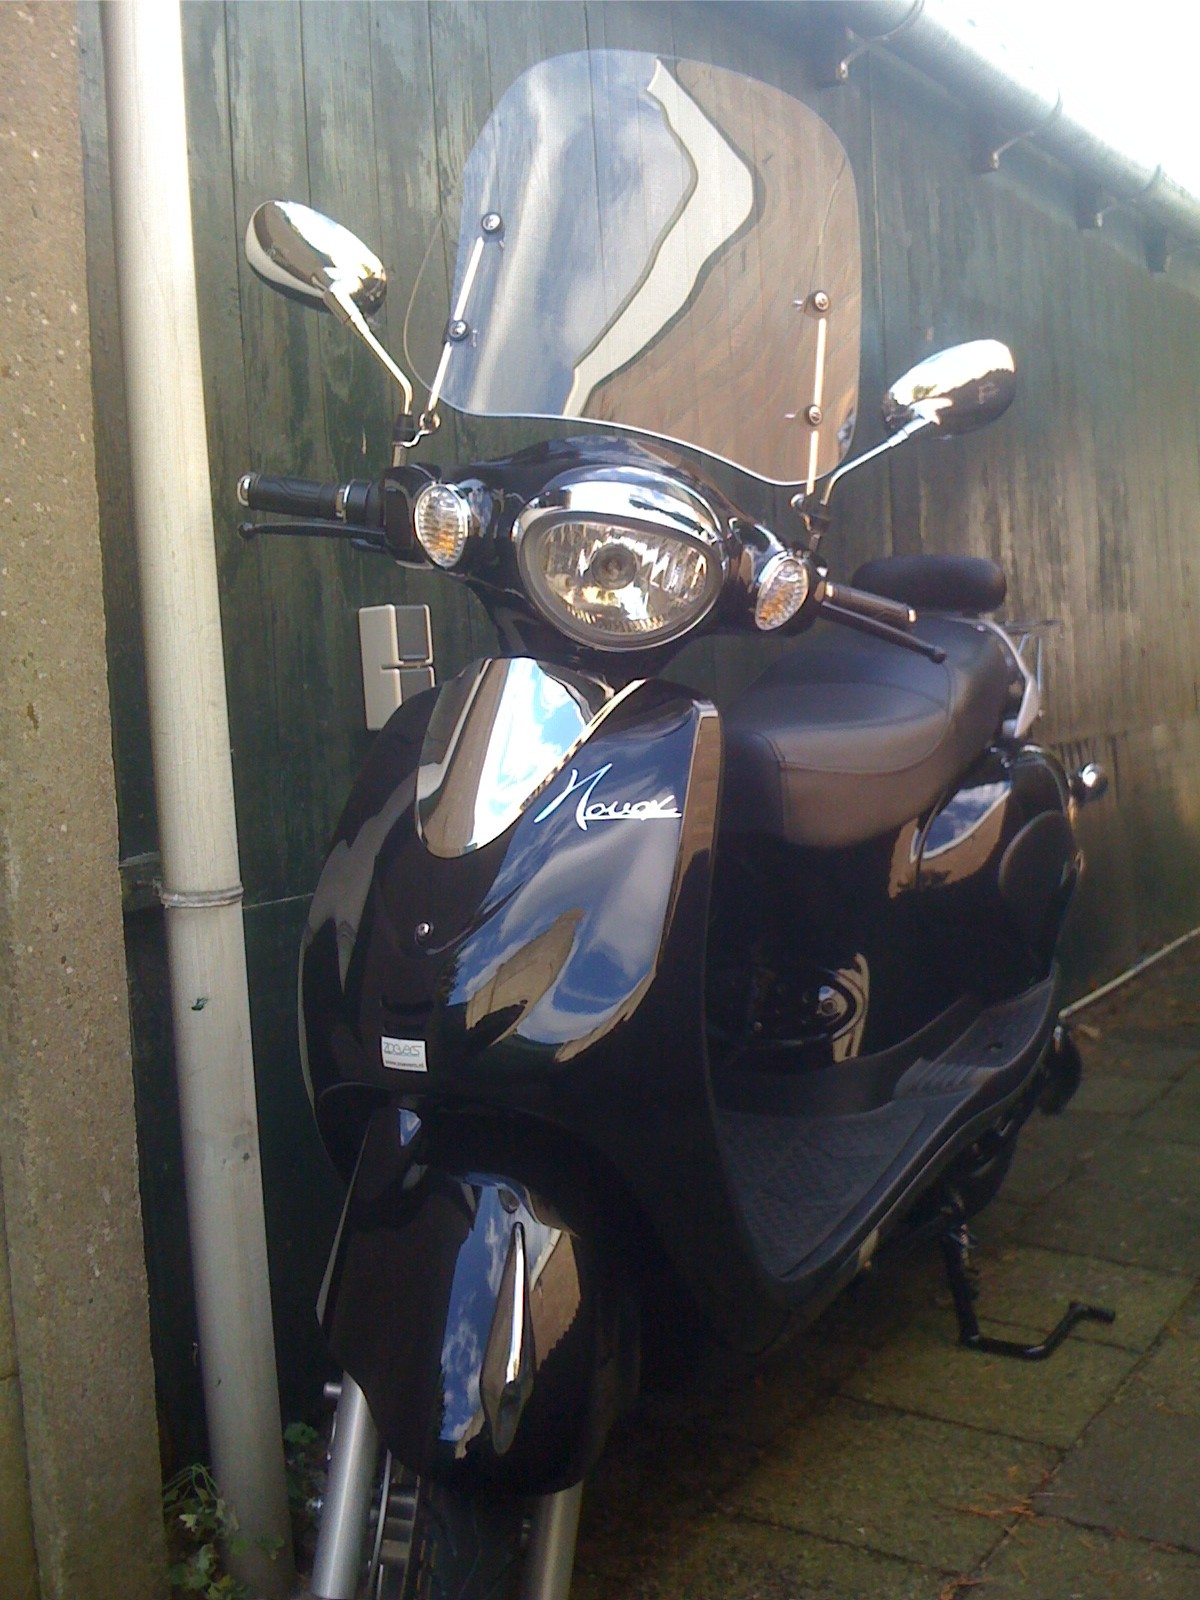 Novox C20 elektrische scooter